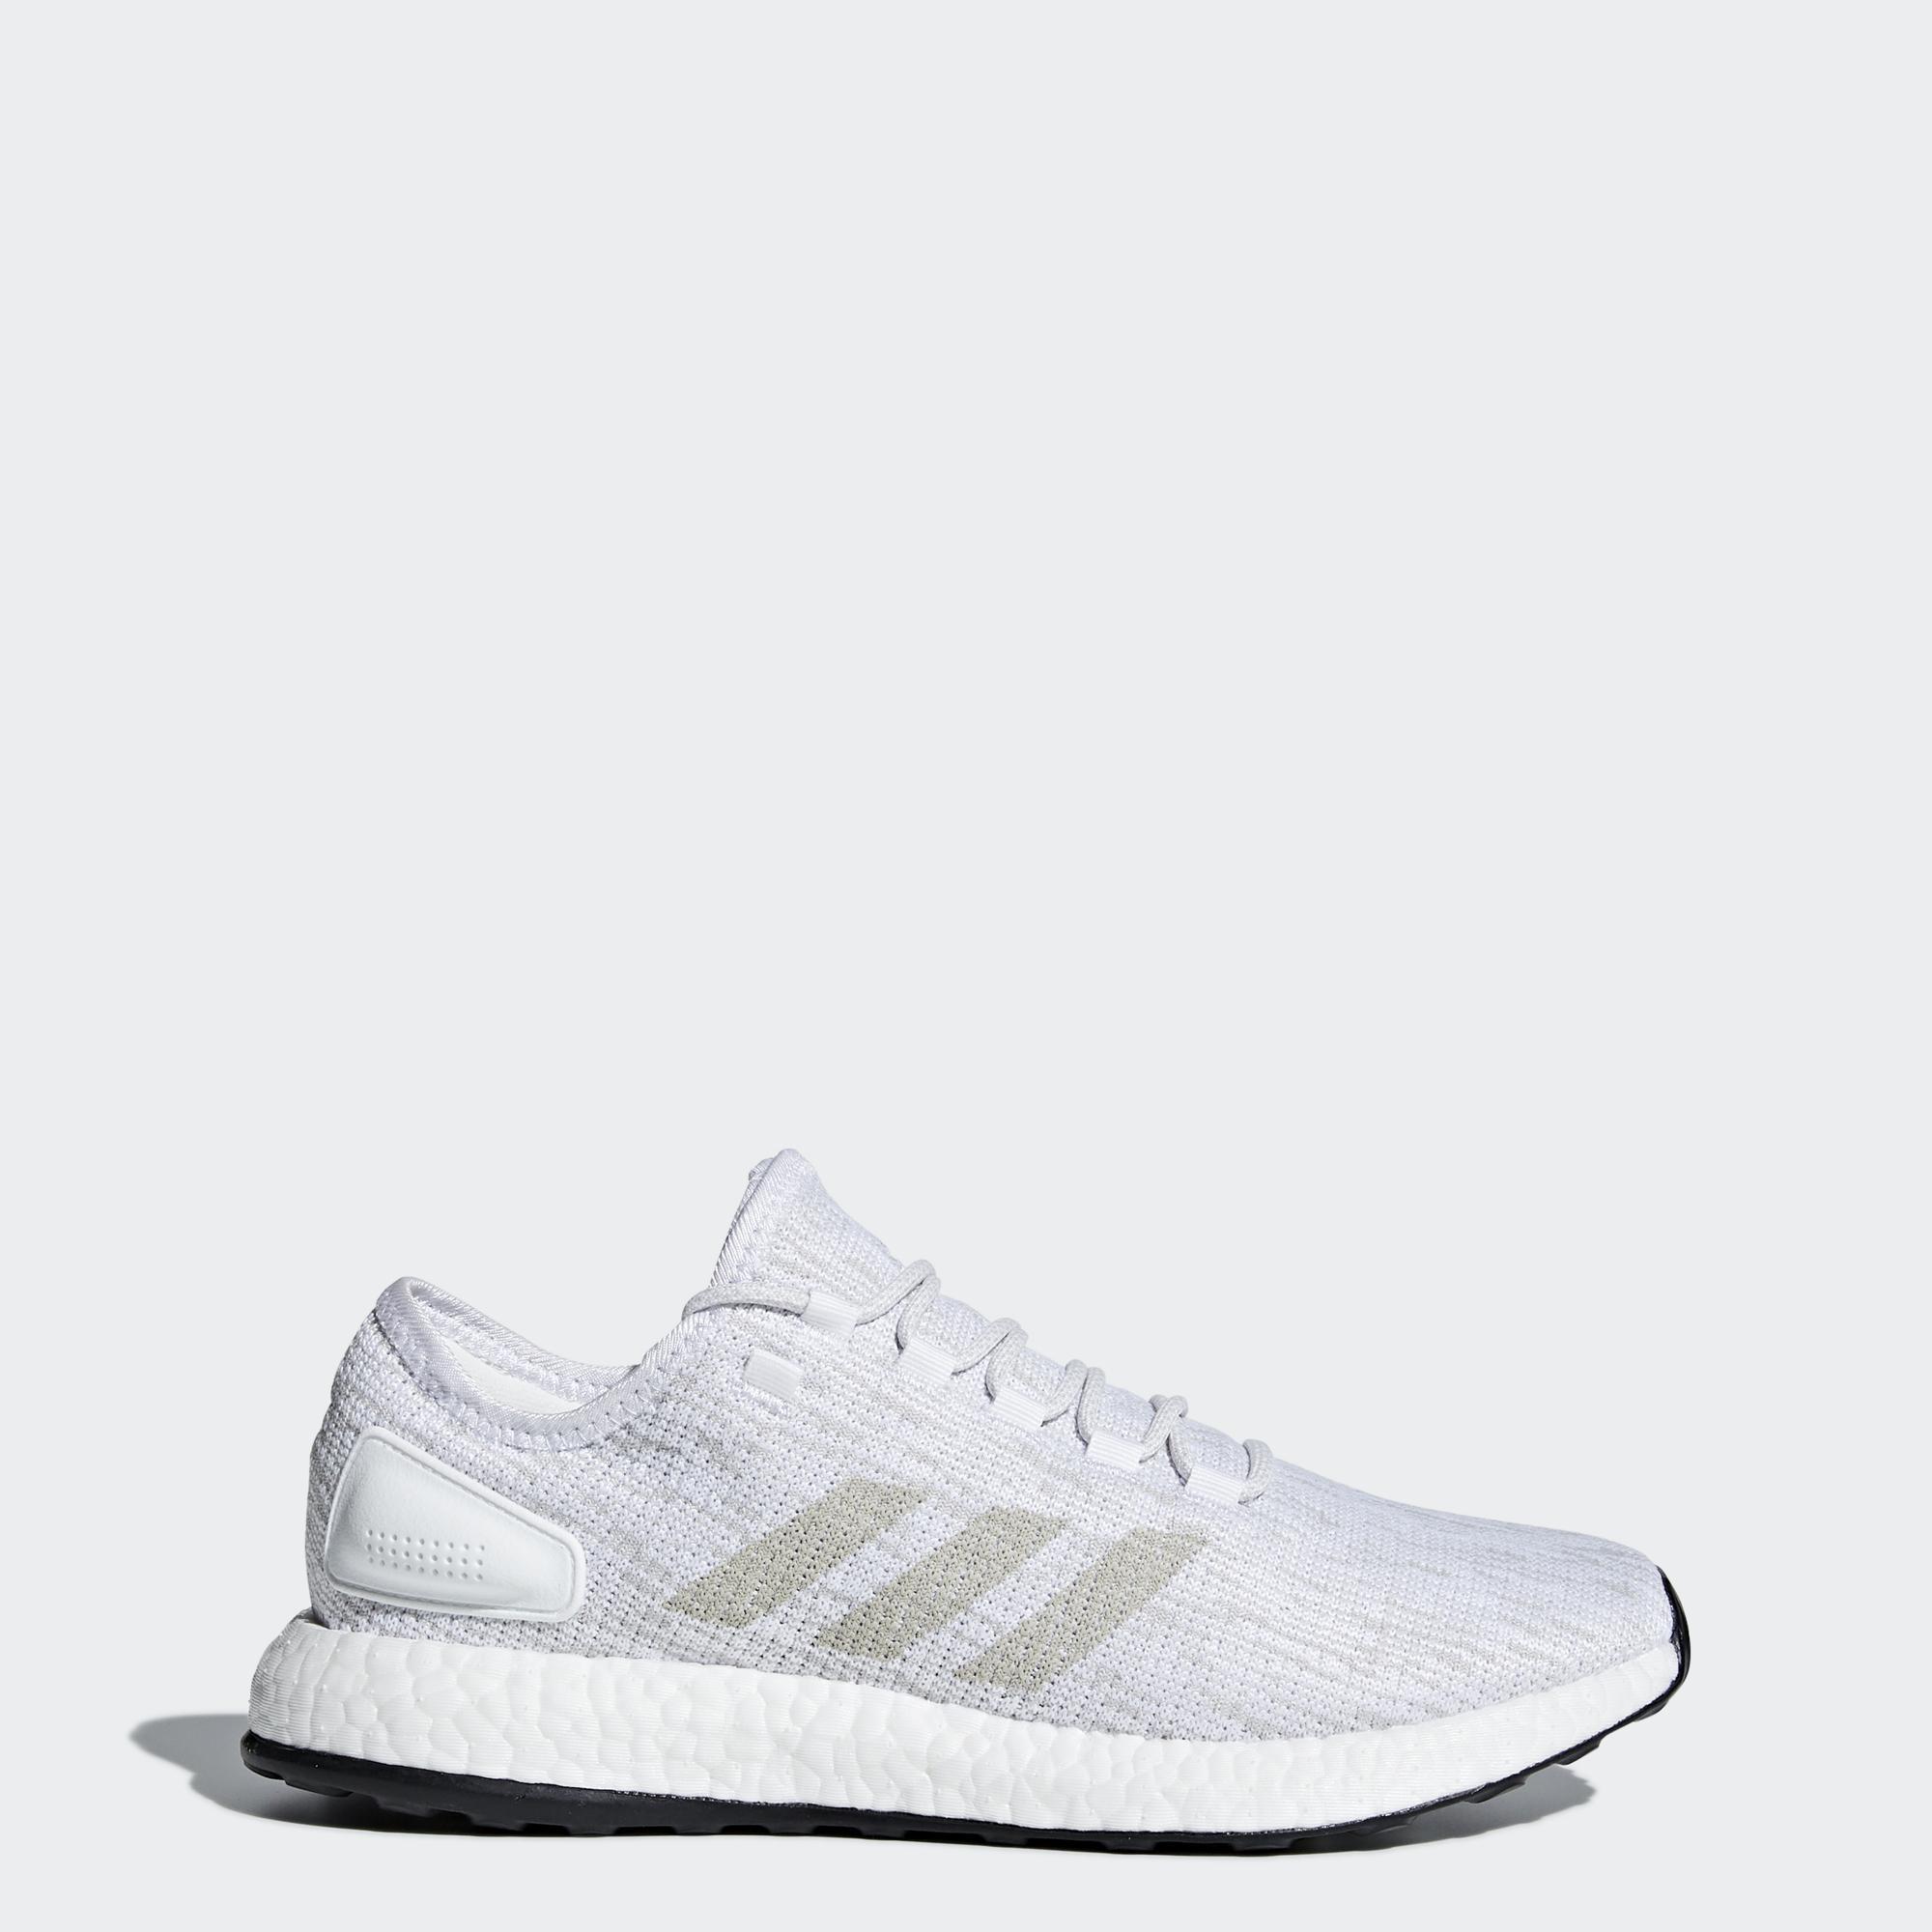 Adidas Shoes Pureboost Ftwr White grey One crystal White - Tifoshop.com 26db8bf6c0e